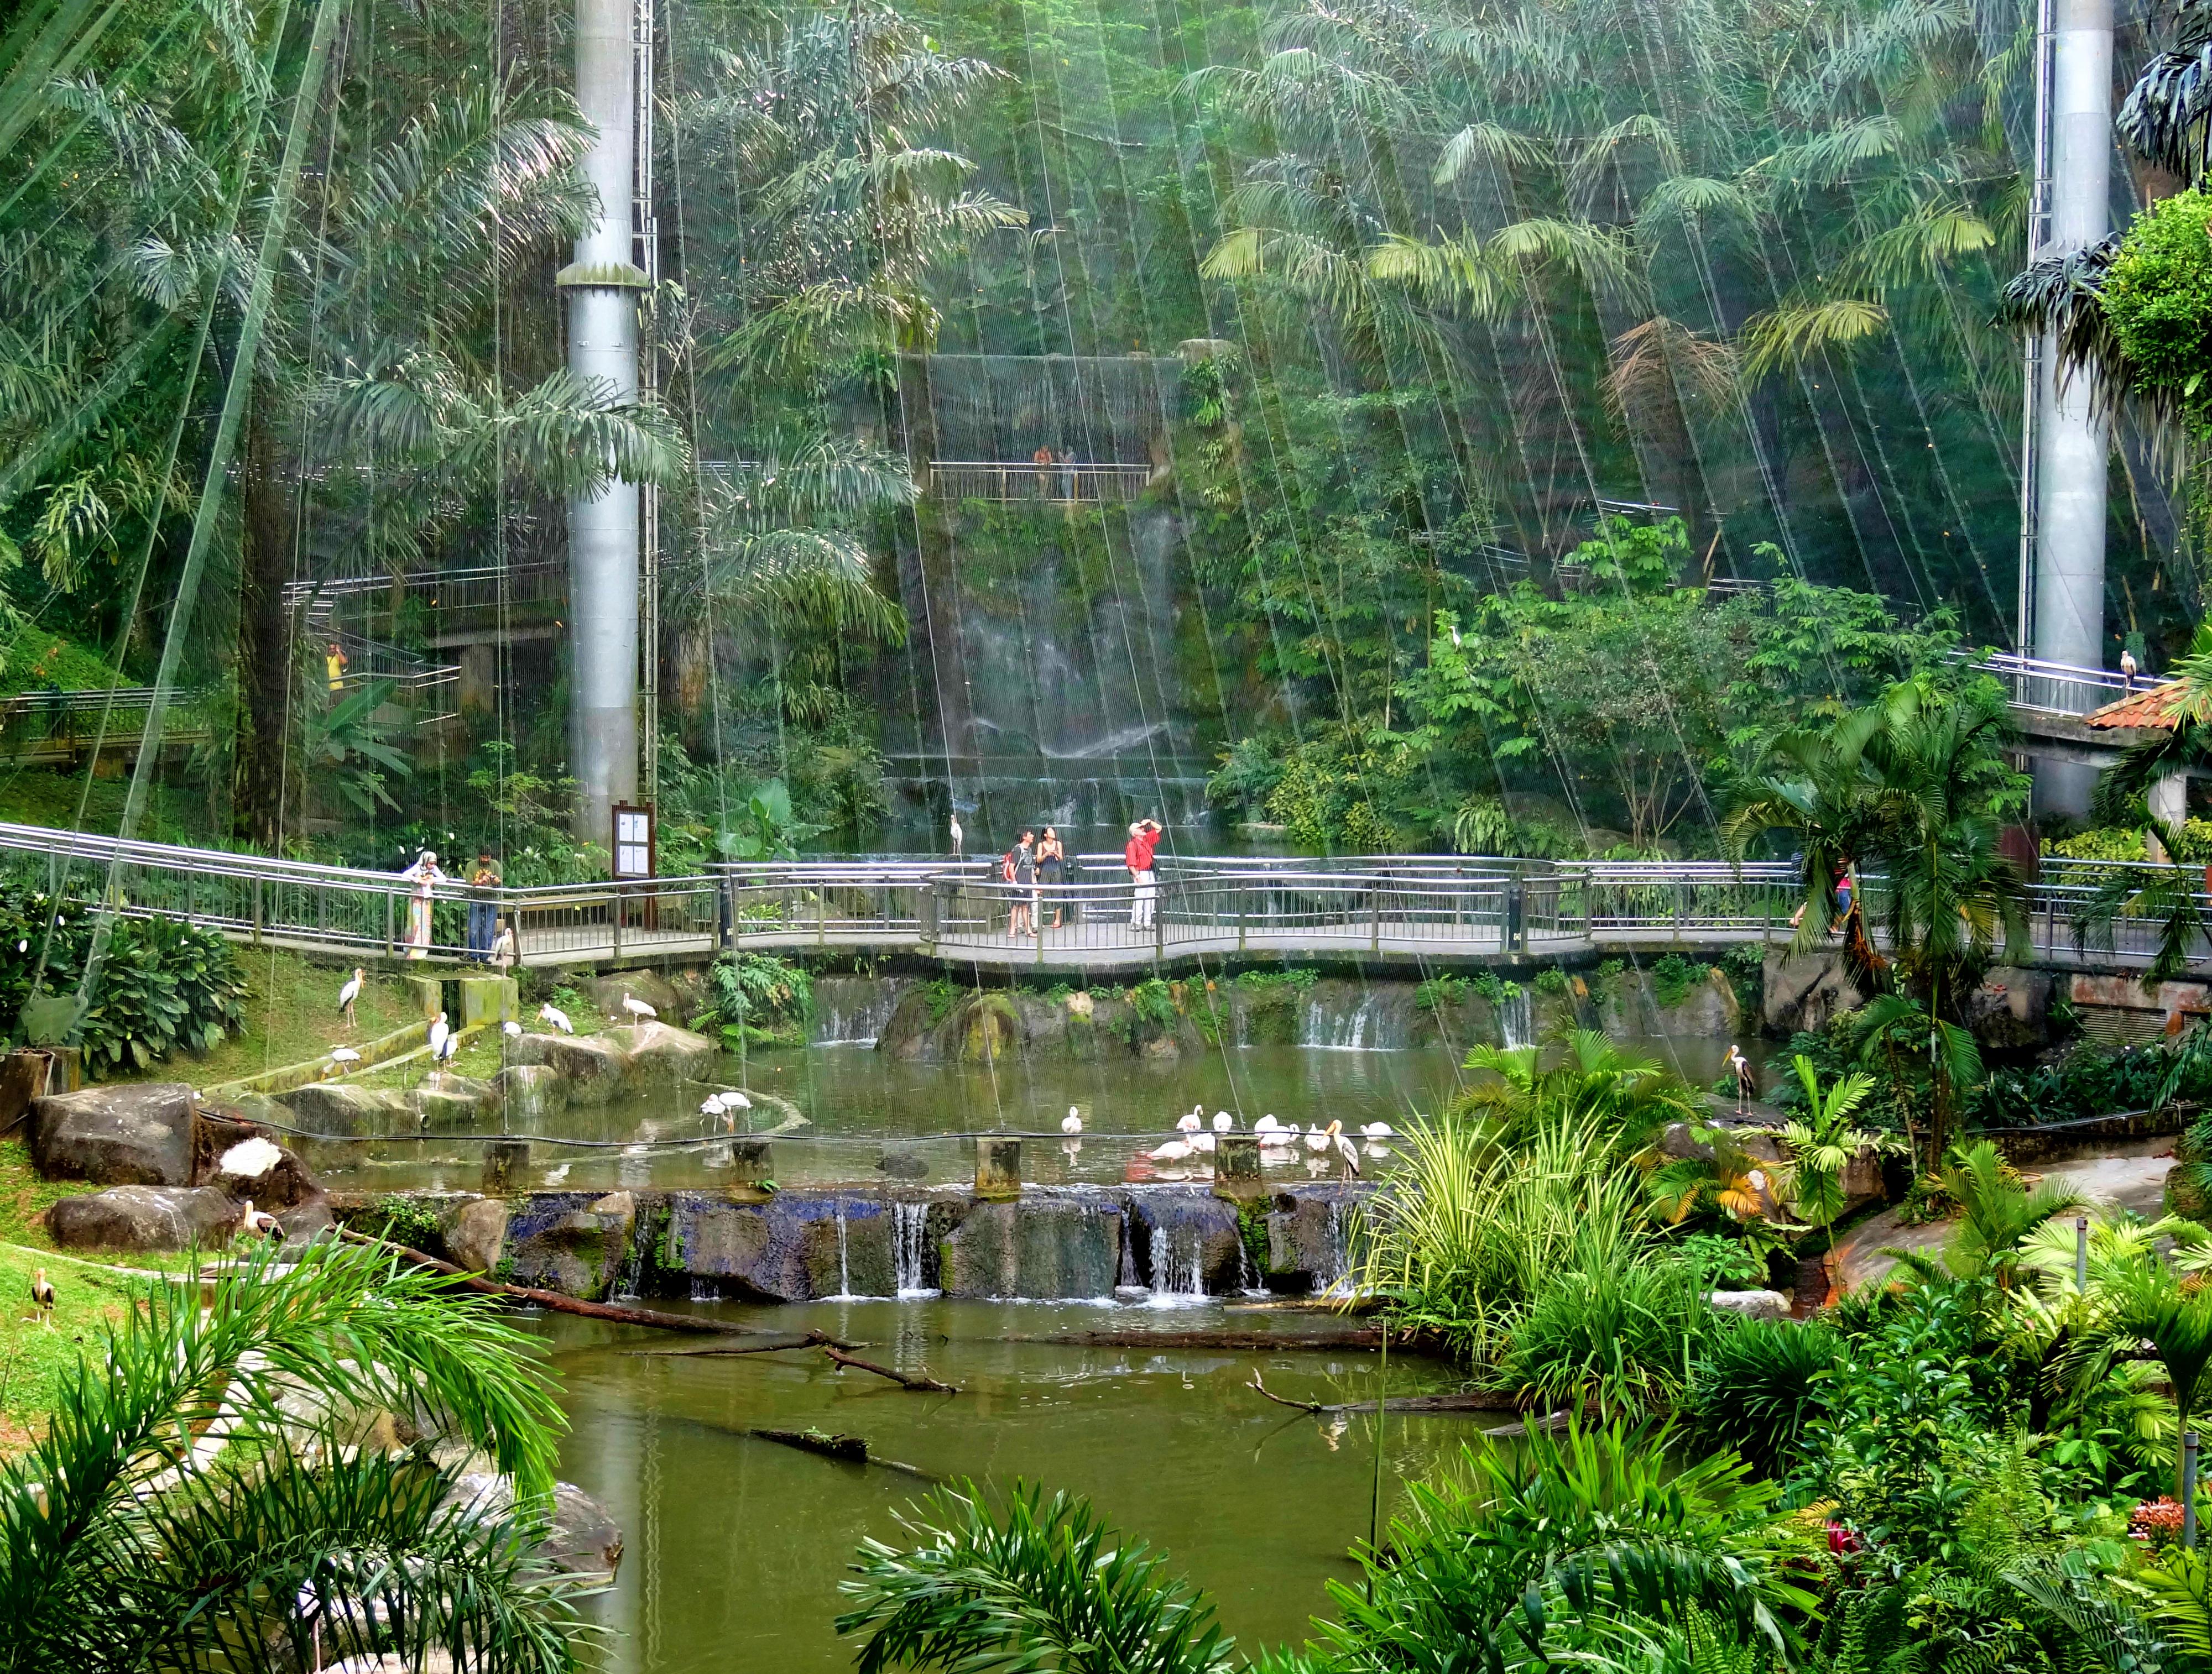 kuala-lumpur-bird-park-inside